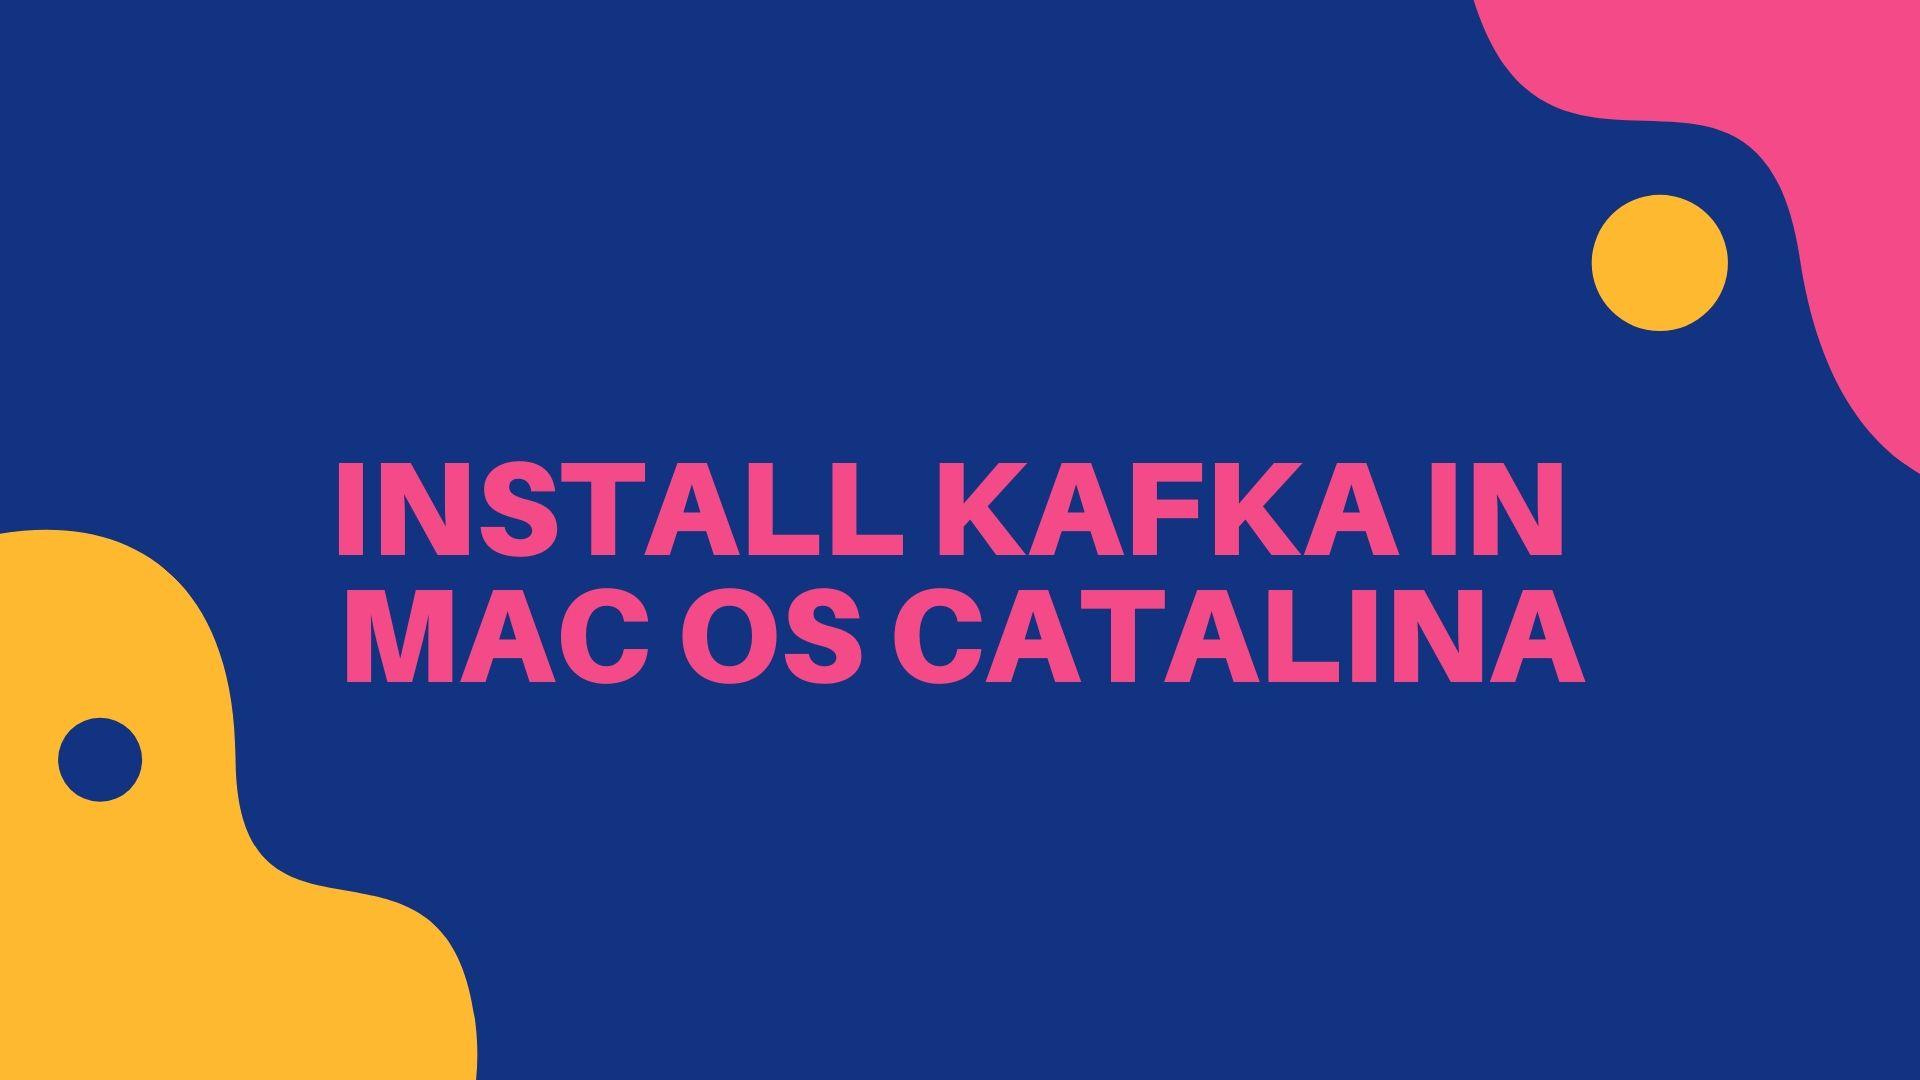 Install kafka in macos catalina using brew